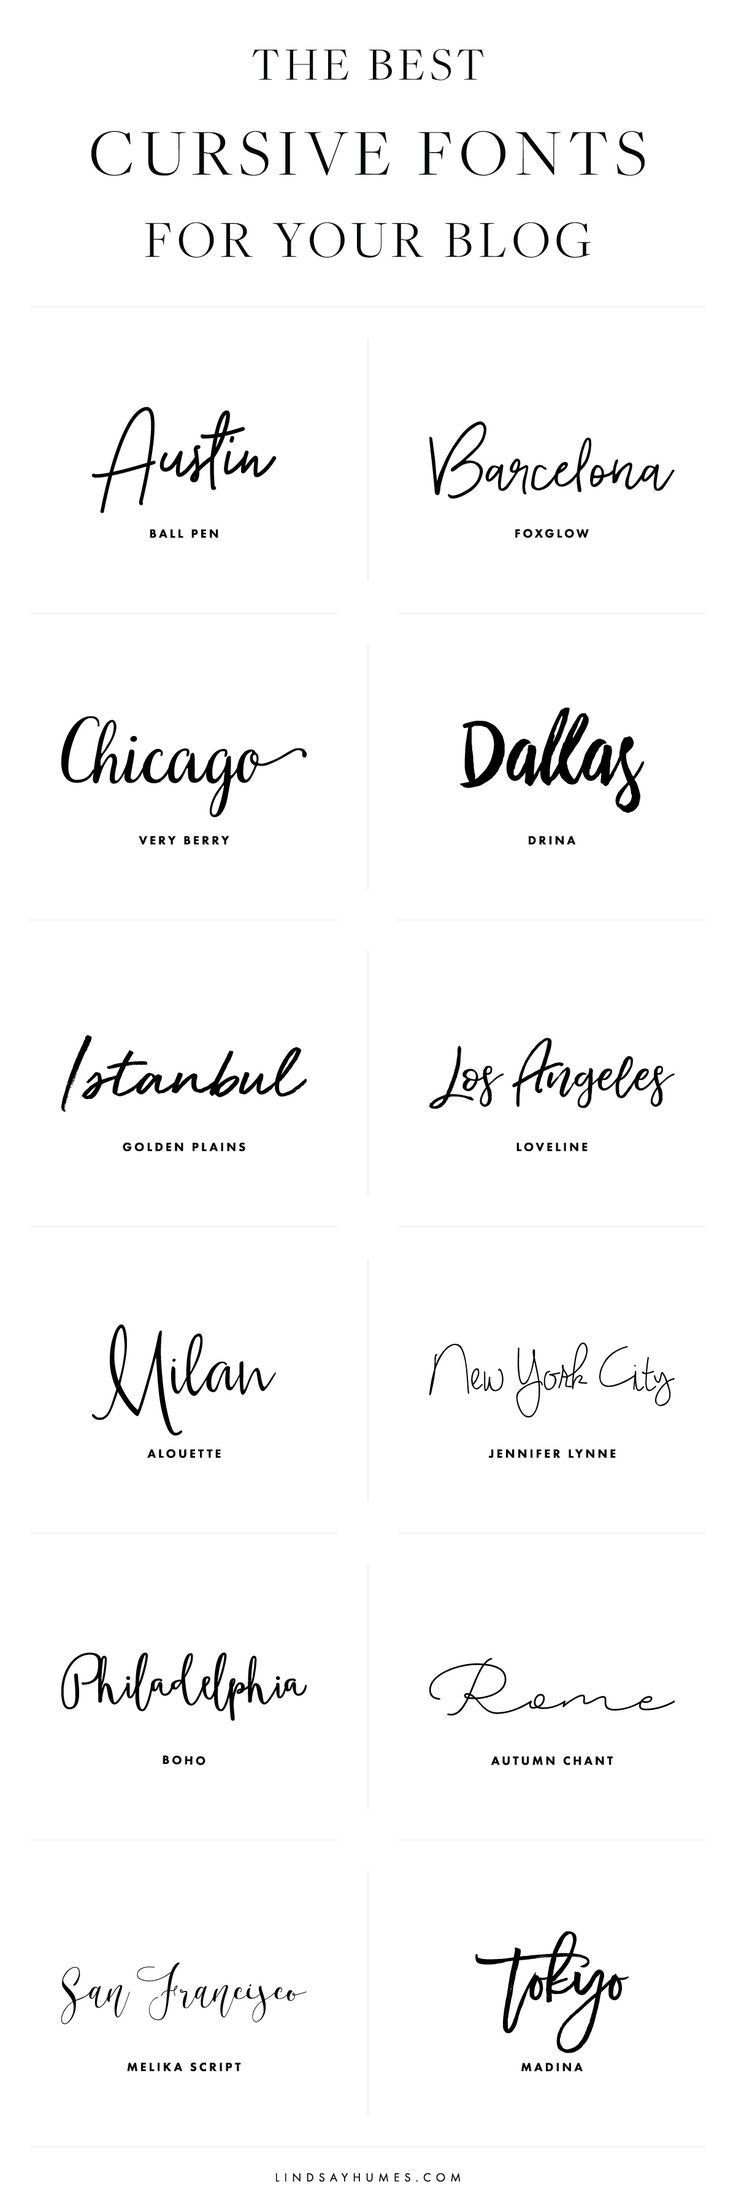 The Best Cursive Fonts For Your Blog Design